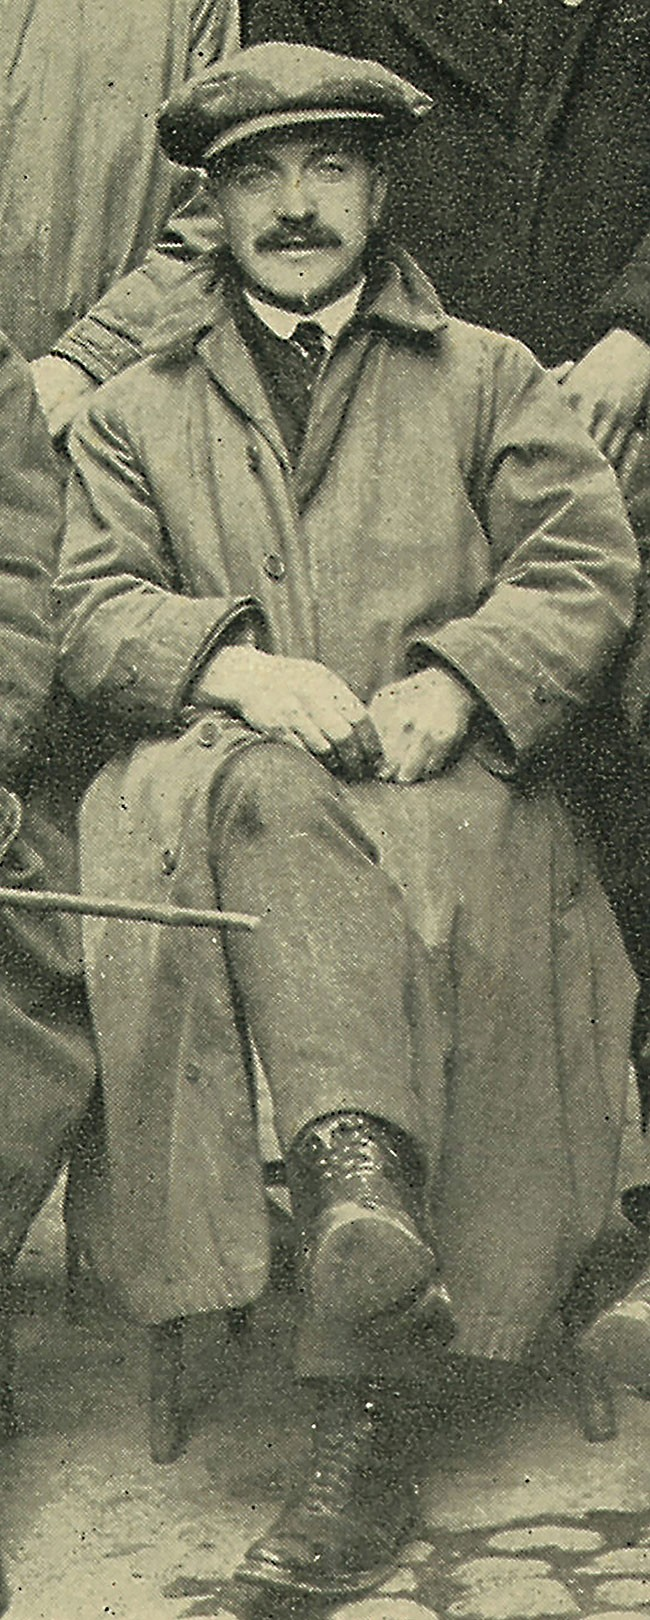 Tomás Mac Curtain